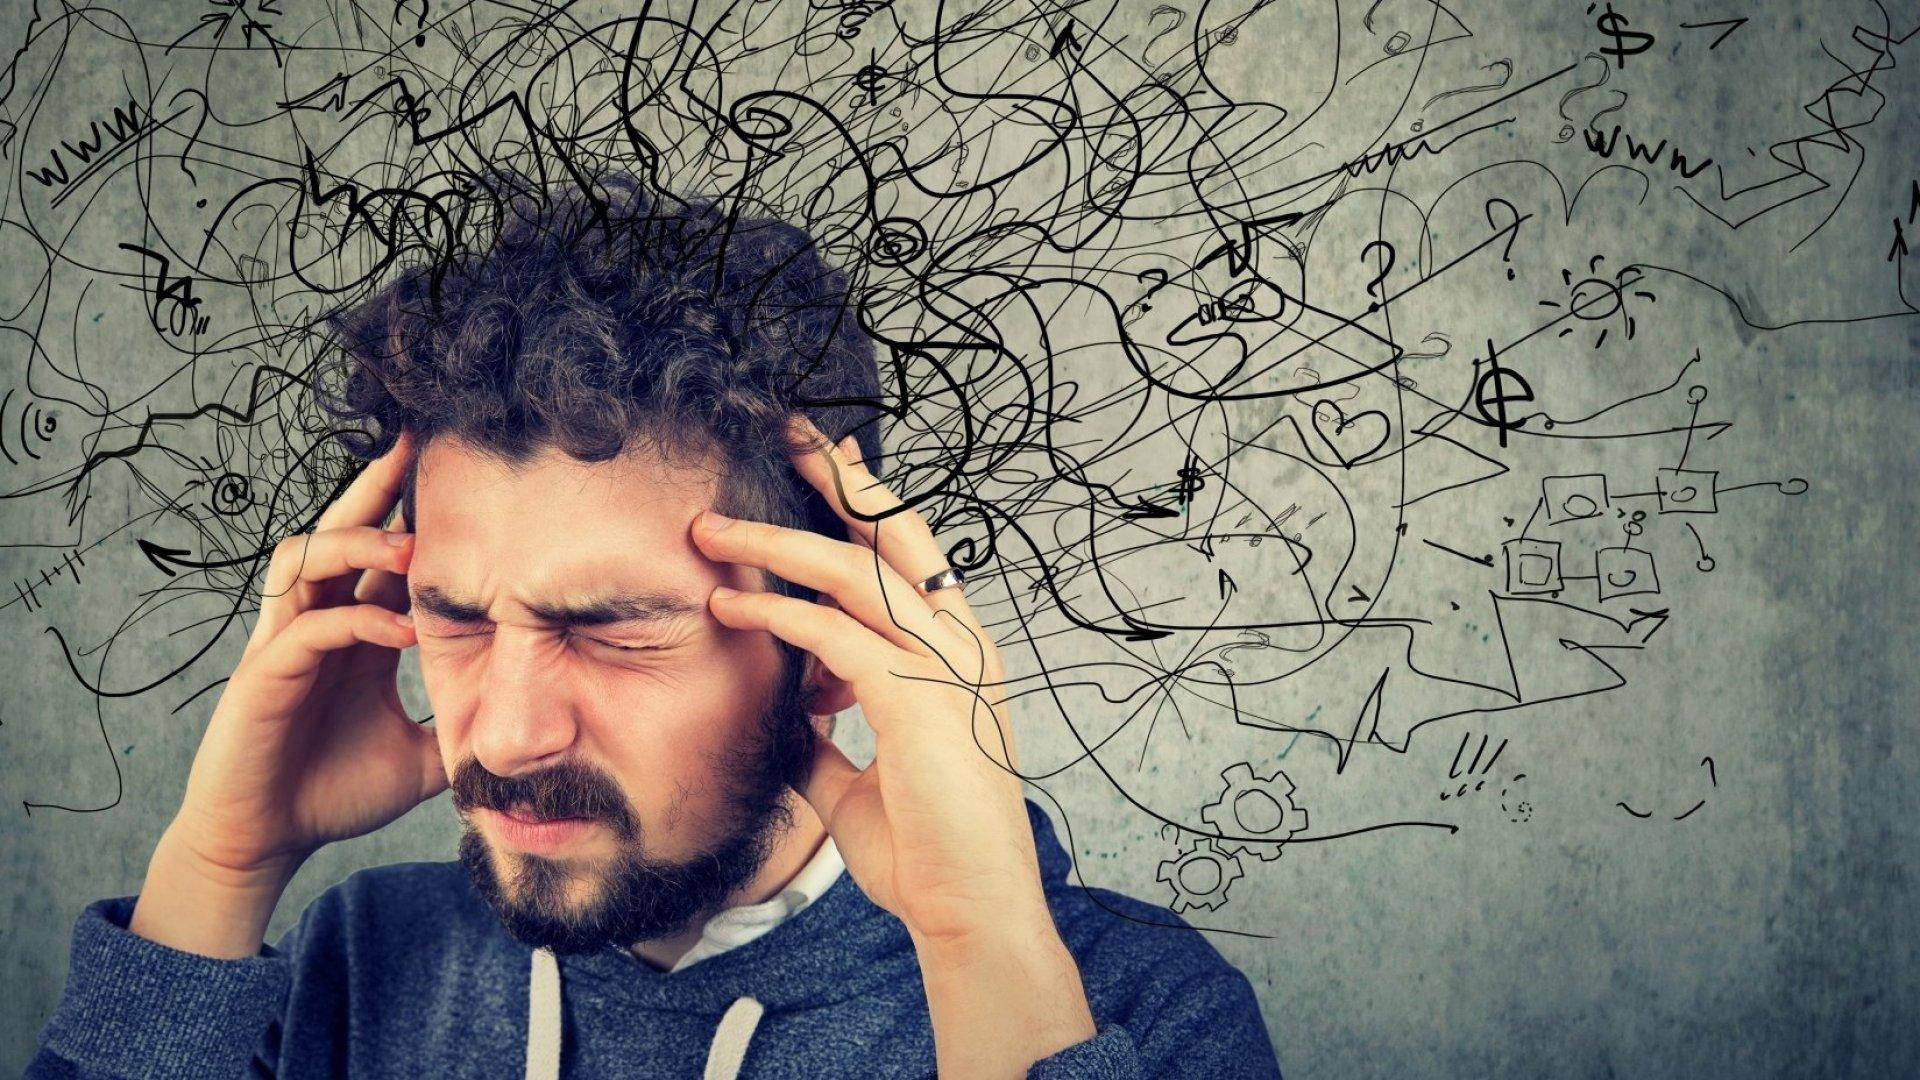 5 Simple Ways Entrepreneurs Can Address Stress